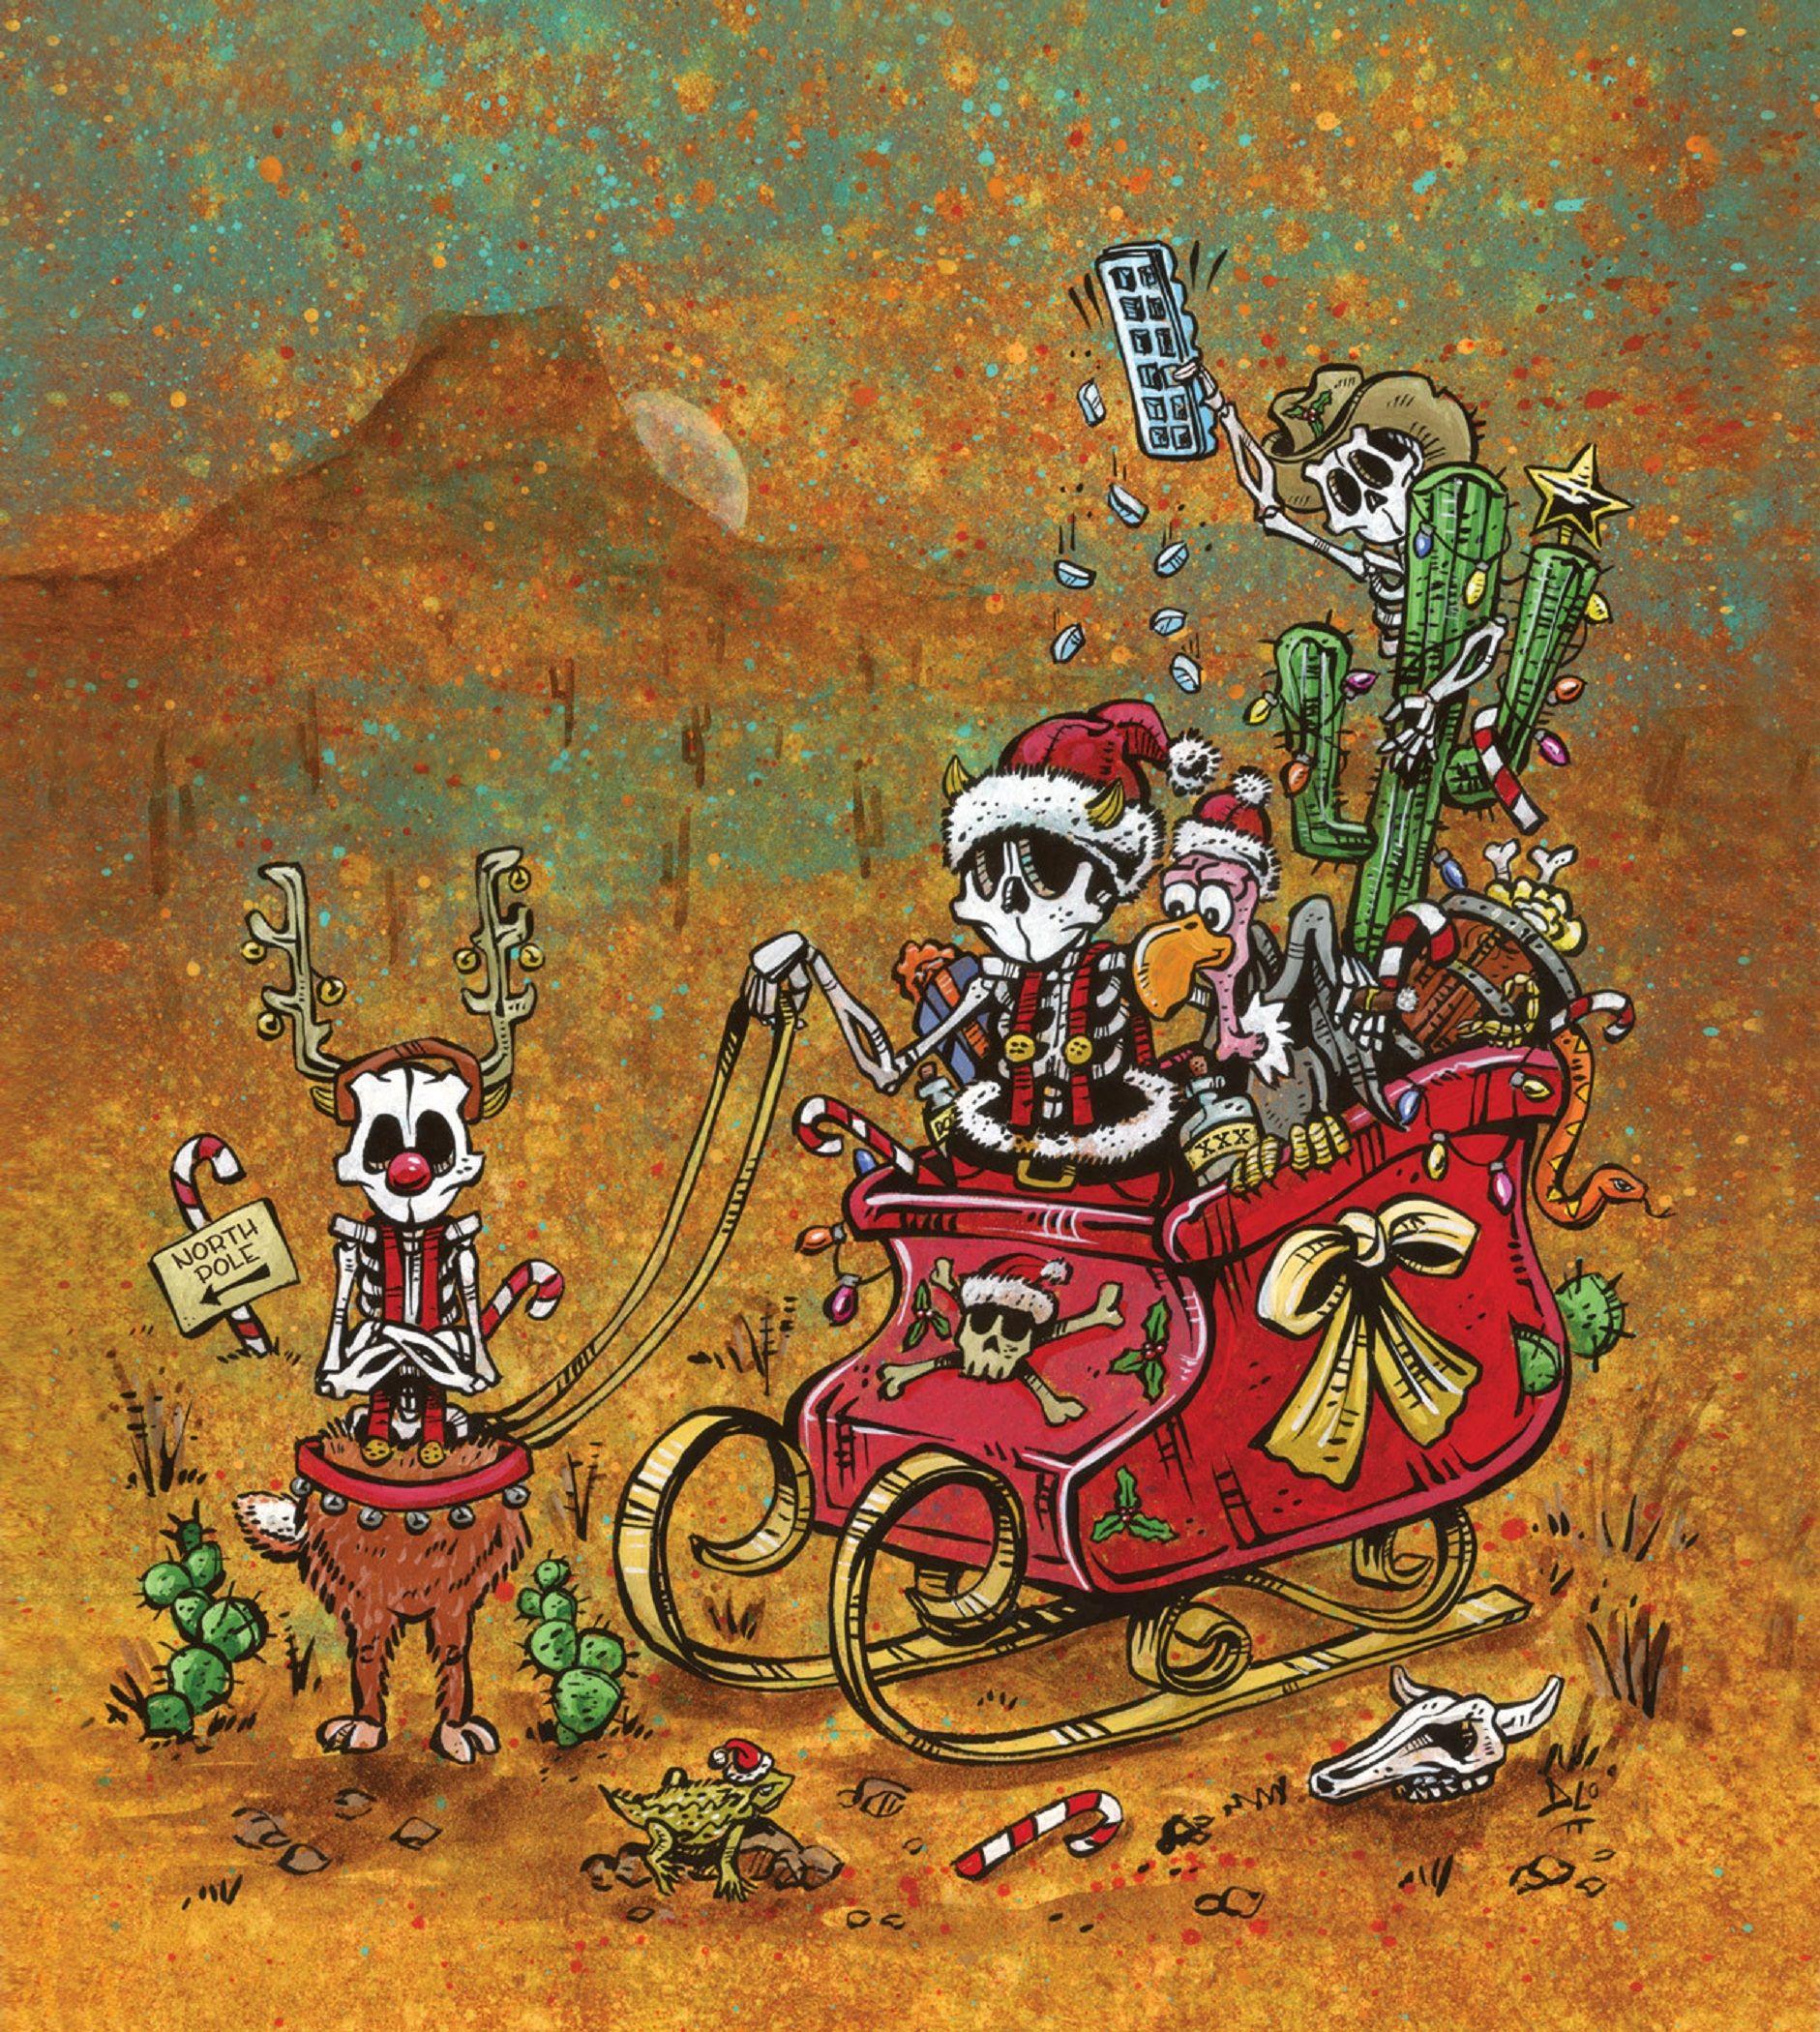 Christmas sleigh day of the dead artist david lozeau